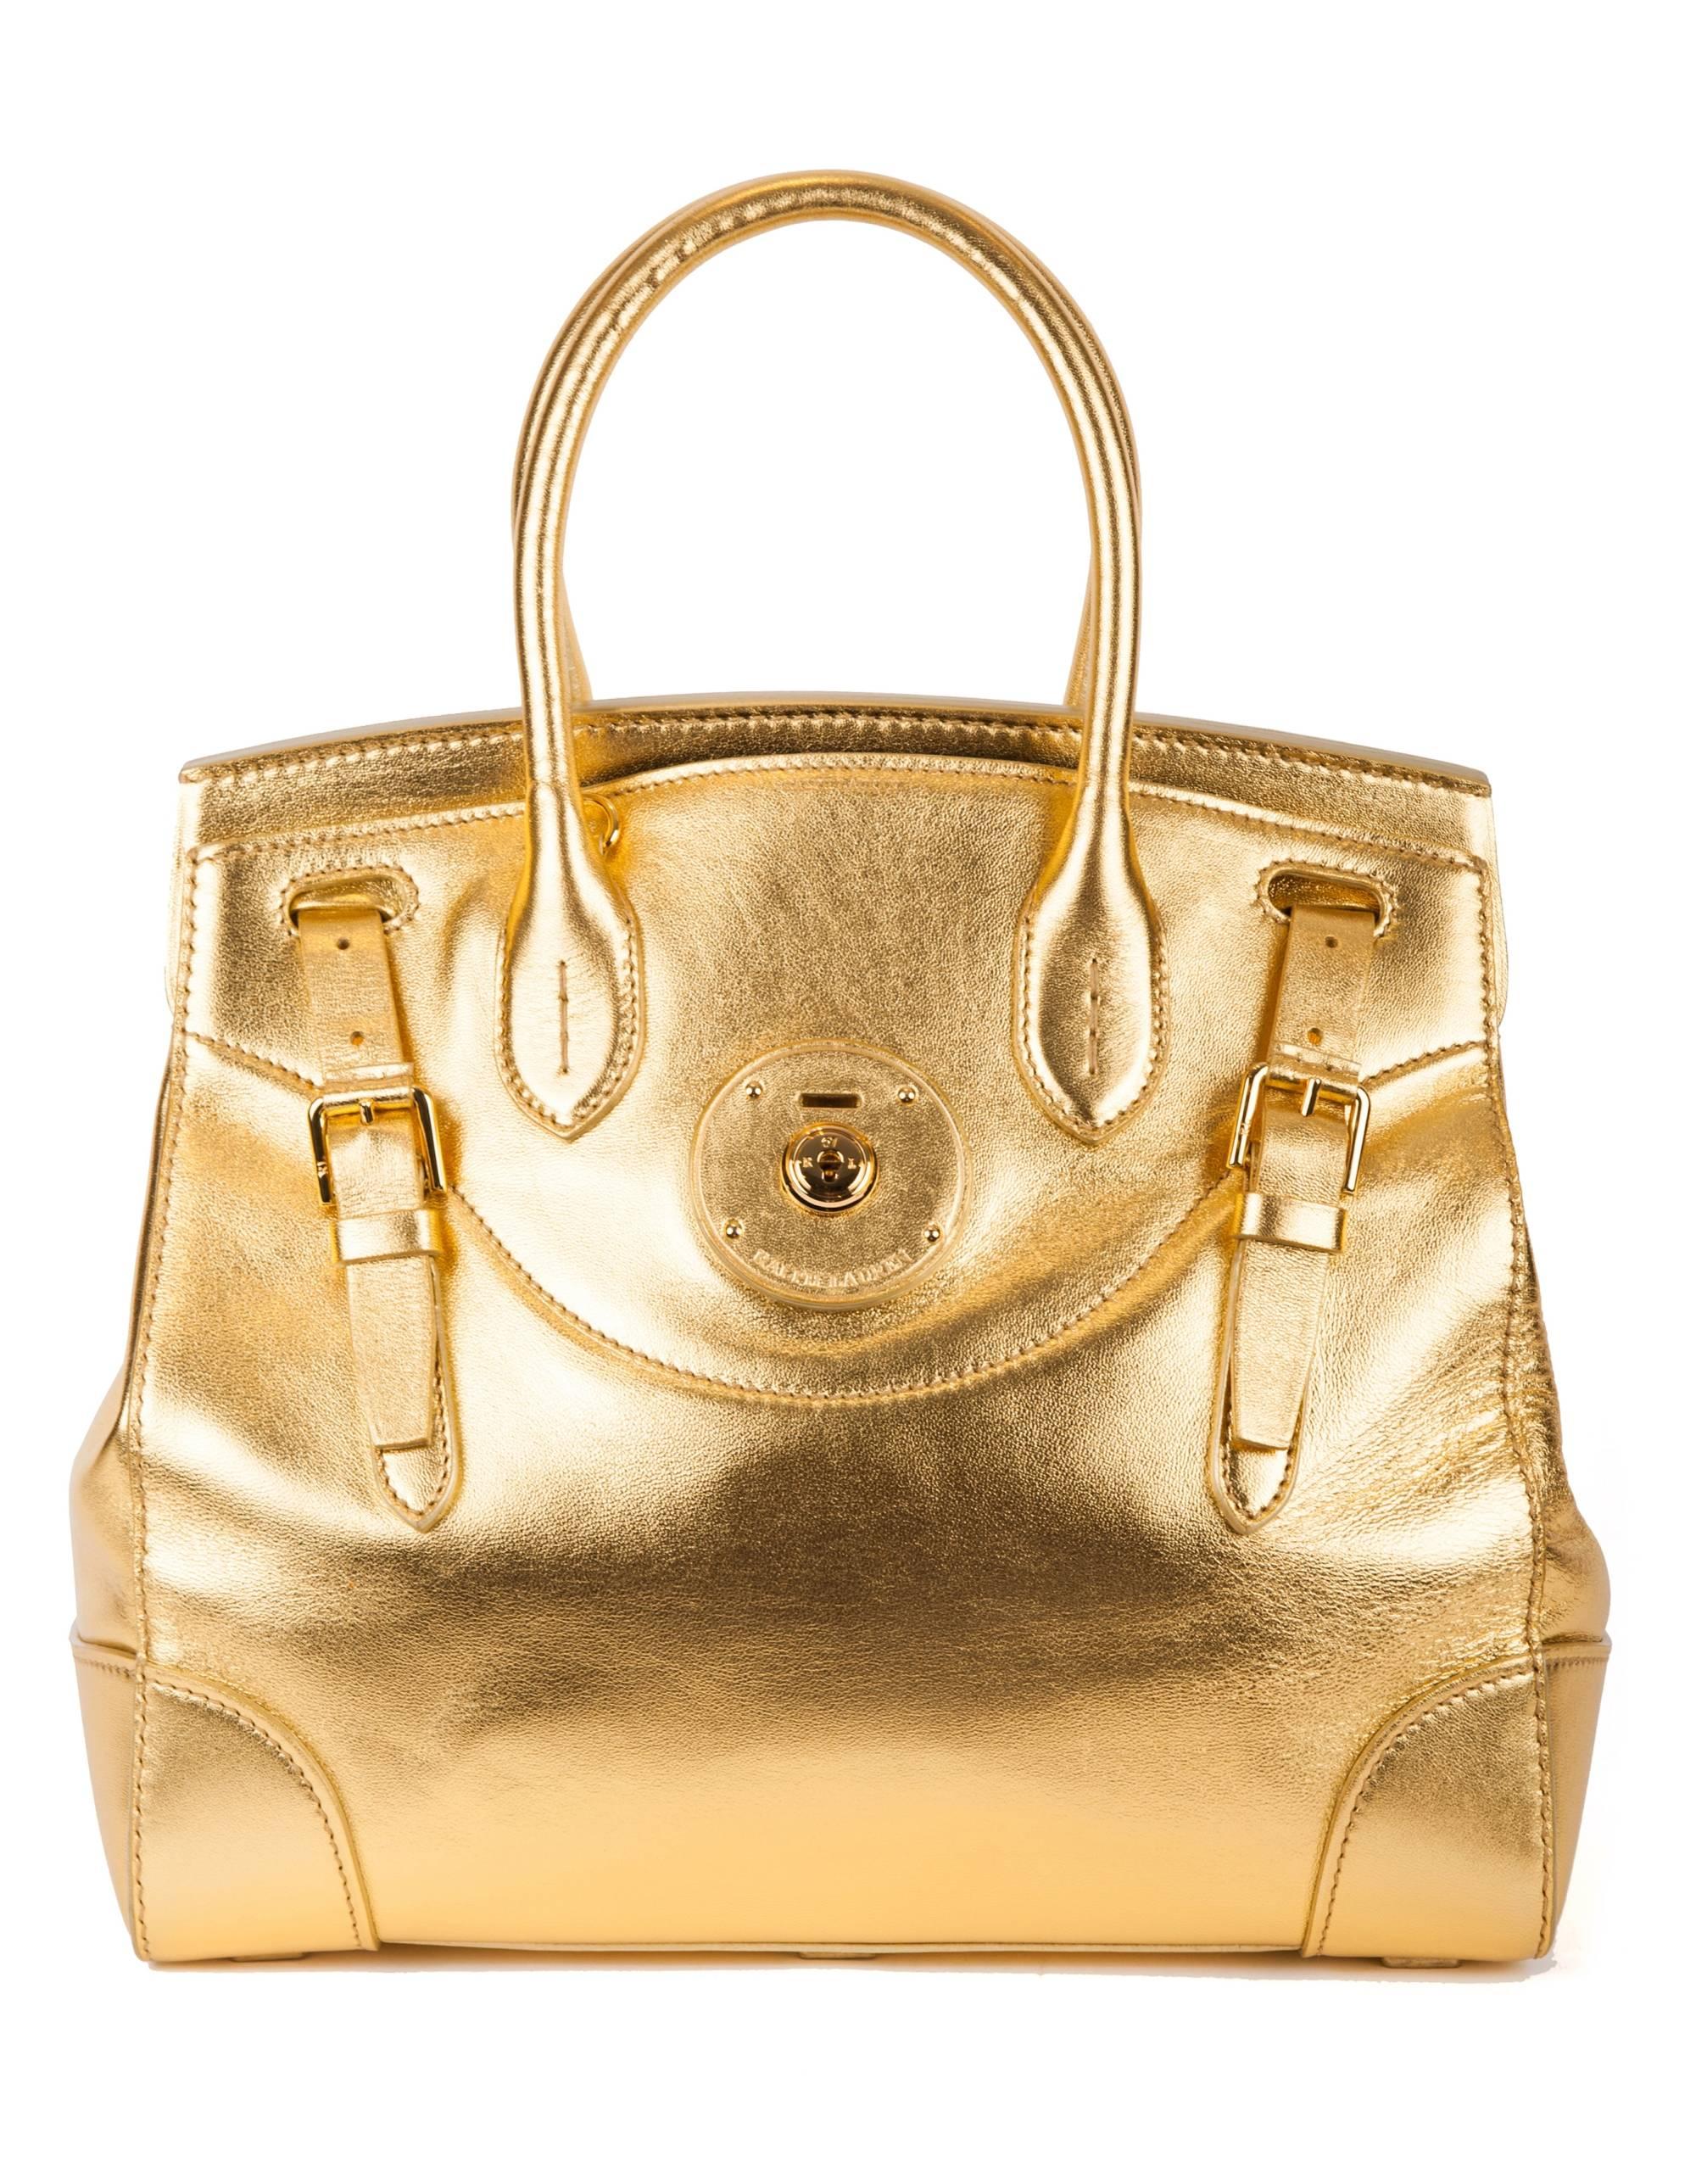 Ralph Lauren Soft Ricky Bag At Harvey Nichols Dubai Aed 10445